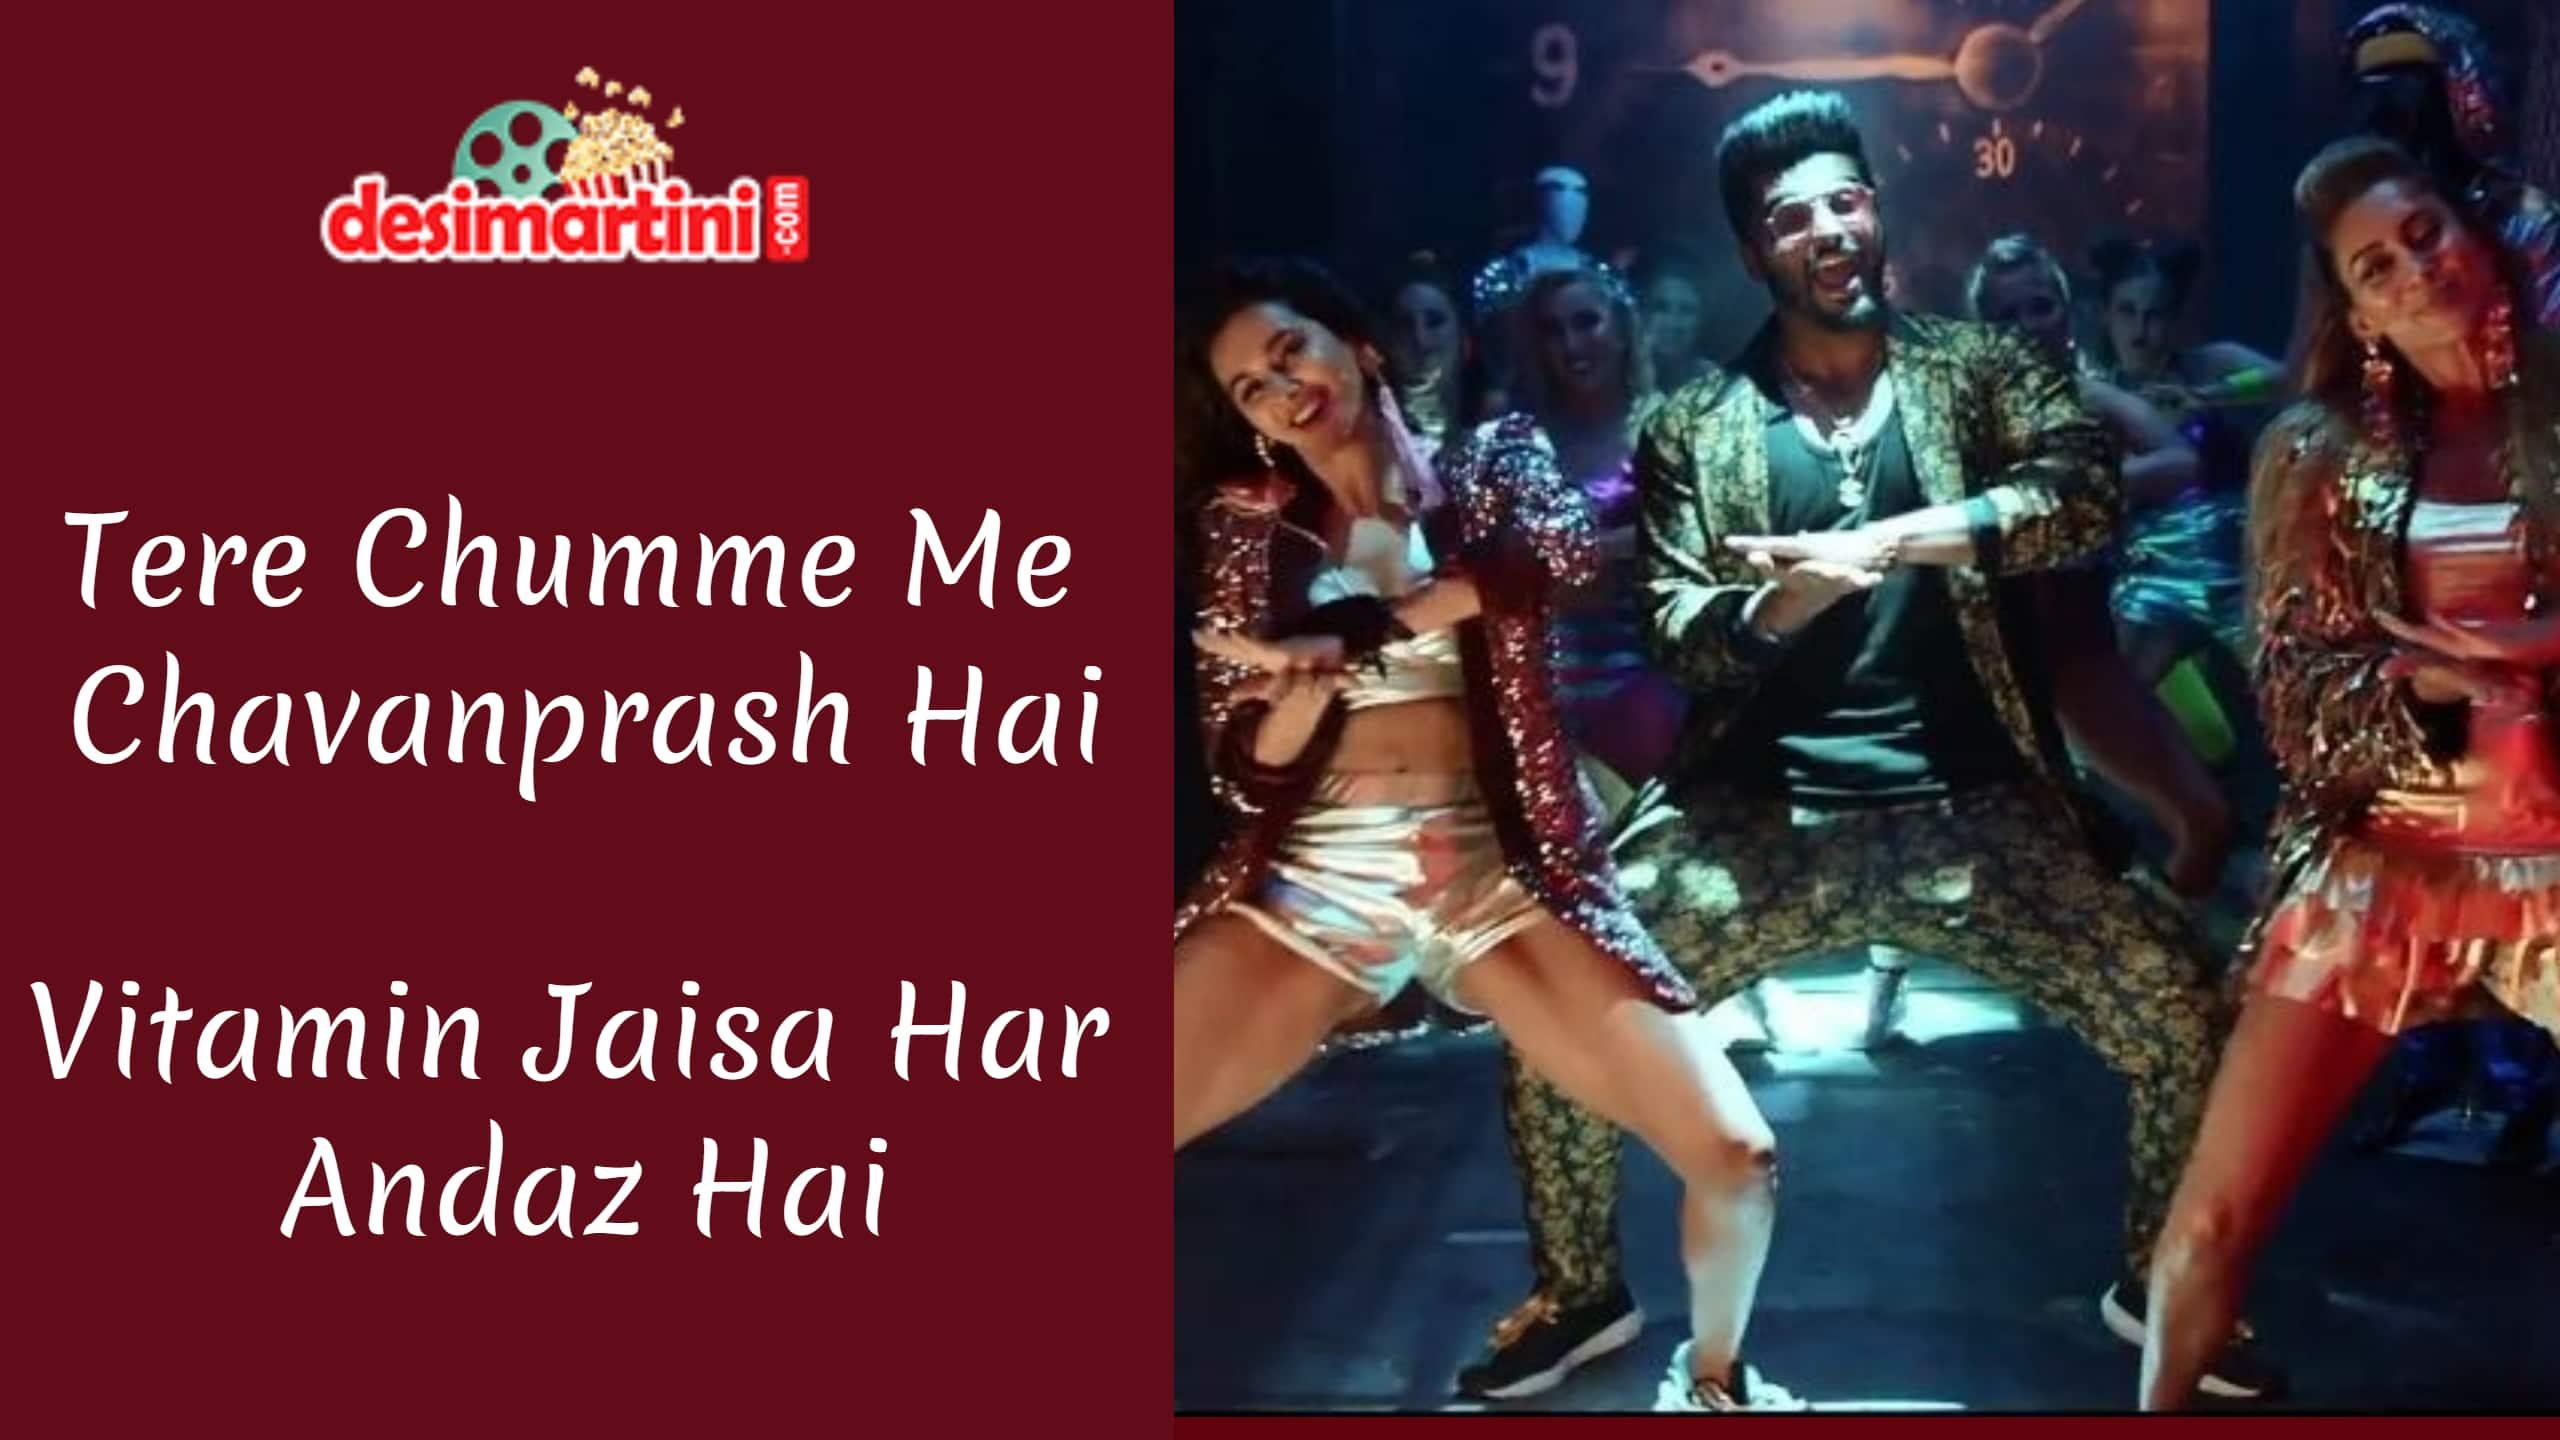 WATCH: Chumme Mein Chavanprash Will Make You Go ROFL With Its Lyrics!